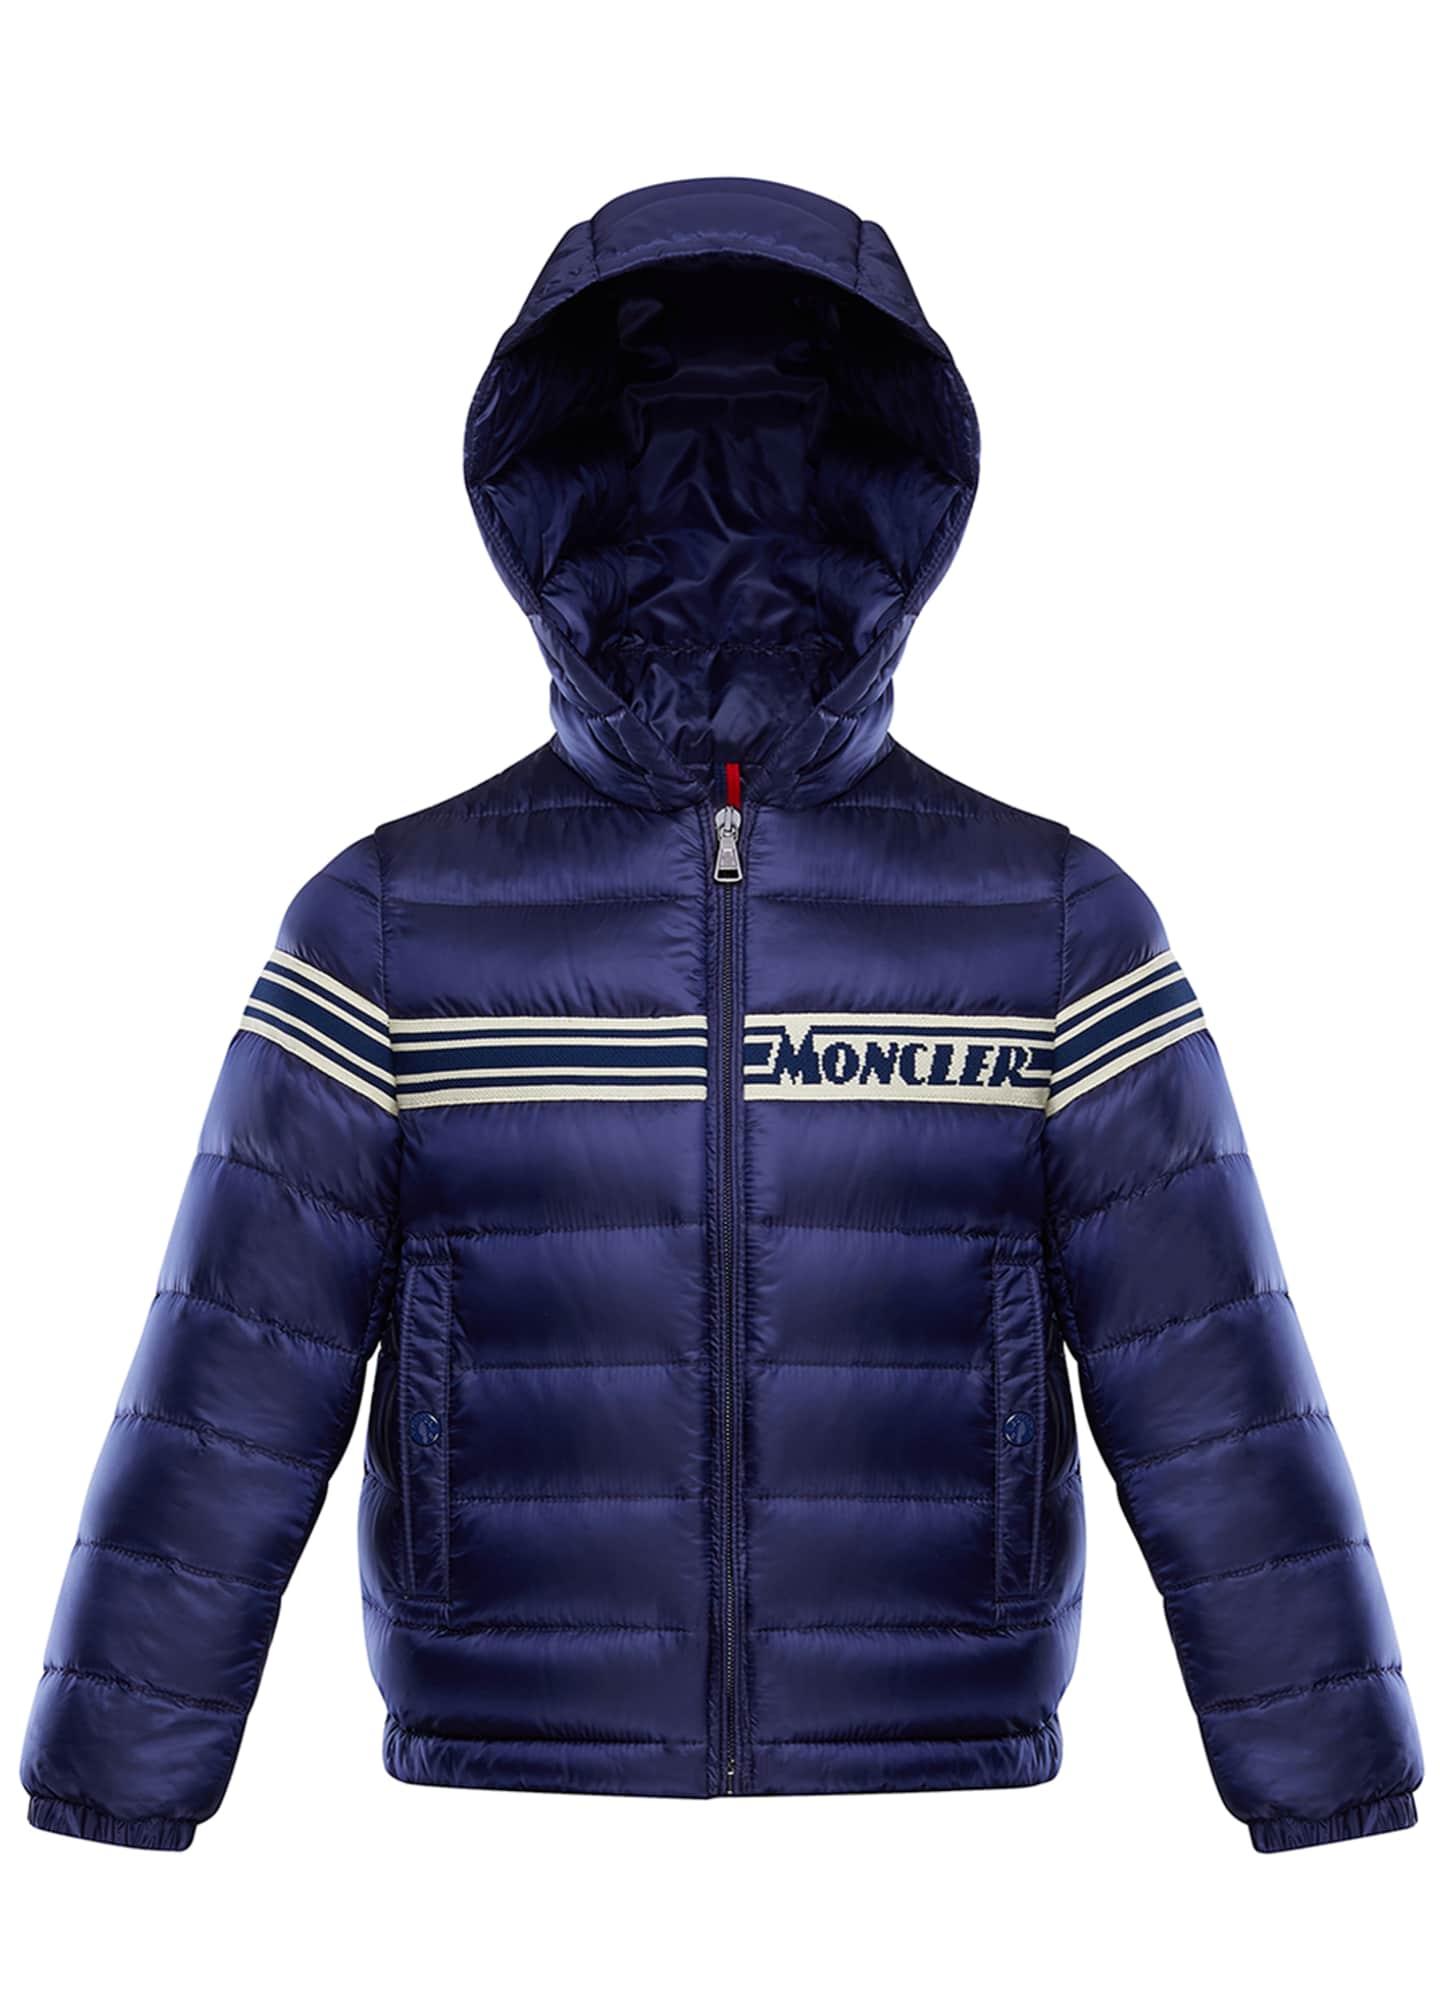 Moncler Boy's Renald Logo Tape Bomber Jacket, Size